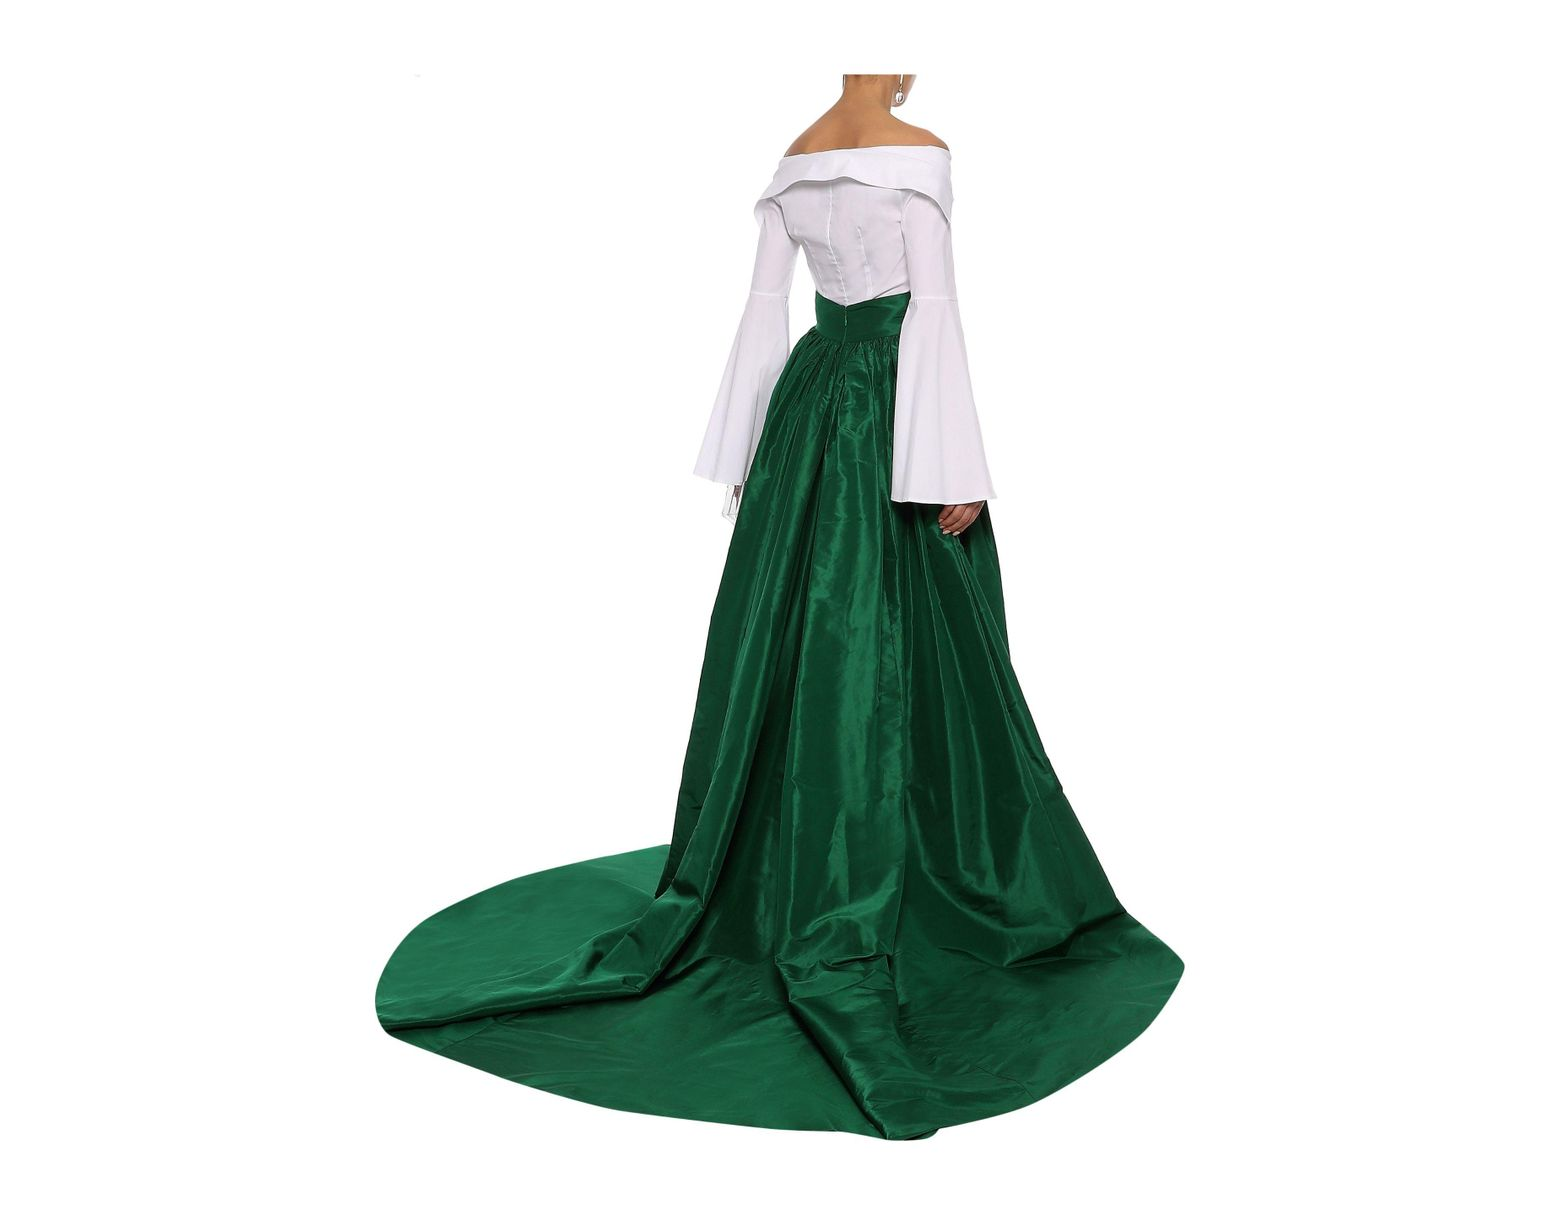 e5956510bd Carolina Herrera Woman Pleated Silk-taffeta Maxi Skirt Emerald in Green -  Lyst